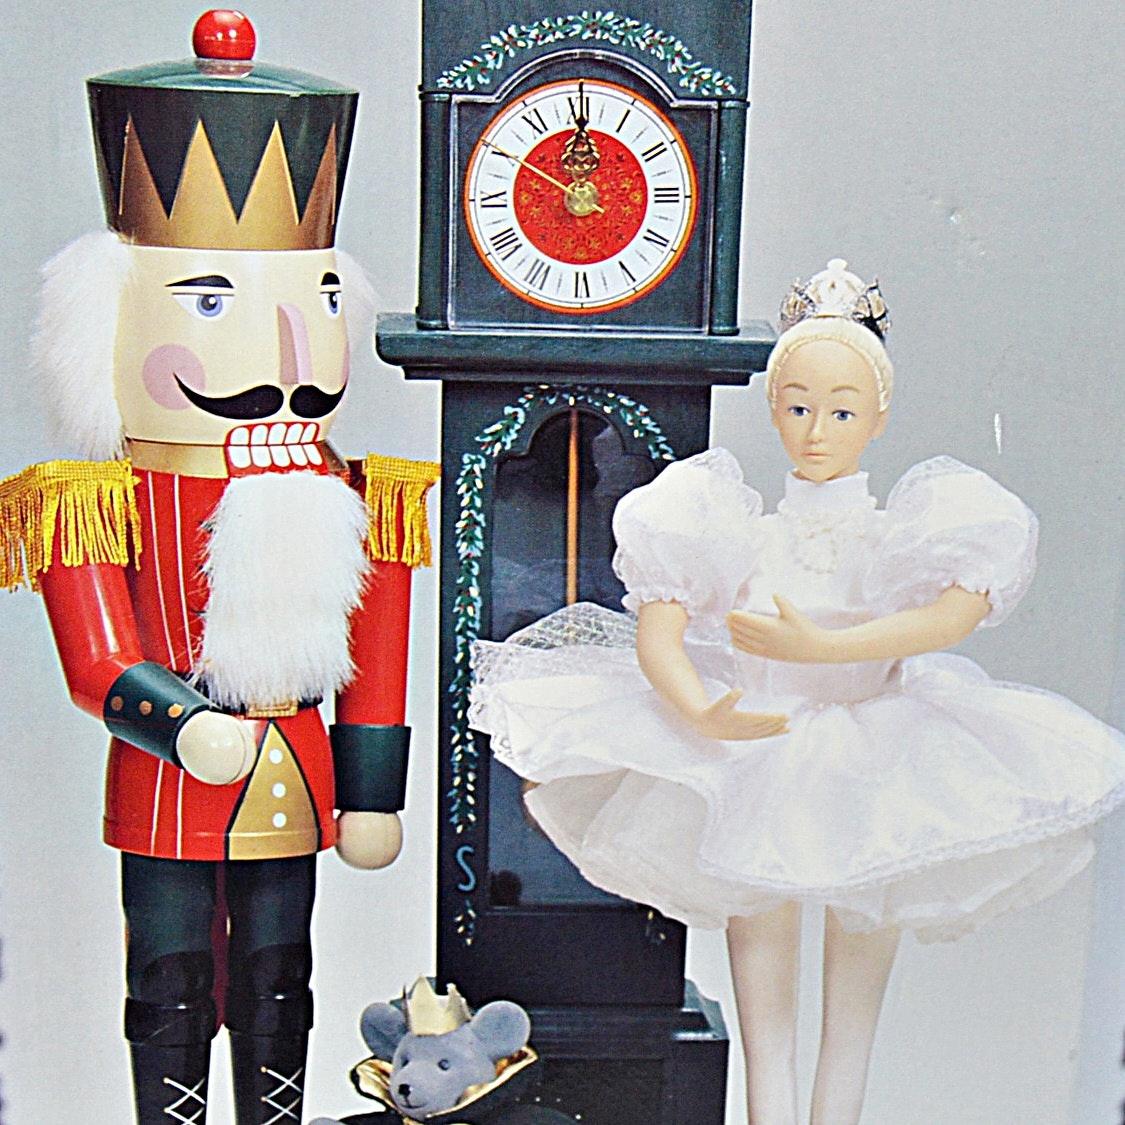 Holiday Musical Ballerina and Nutcracker Display Scene with Seiko Clock